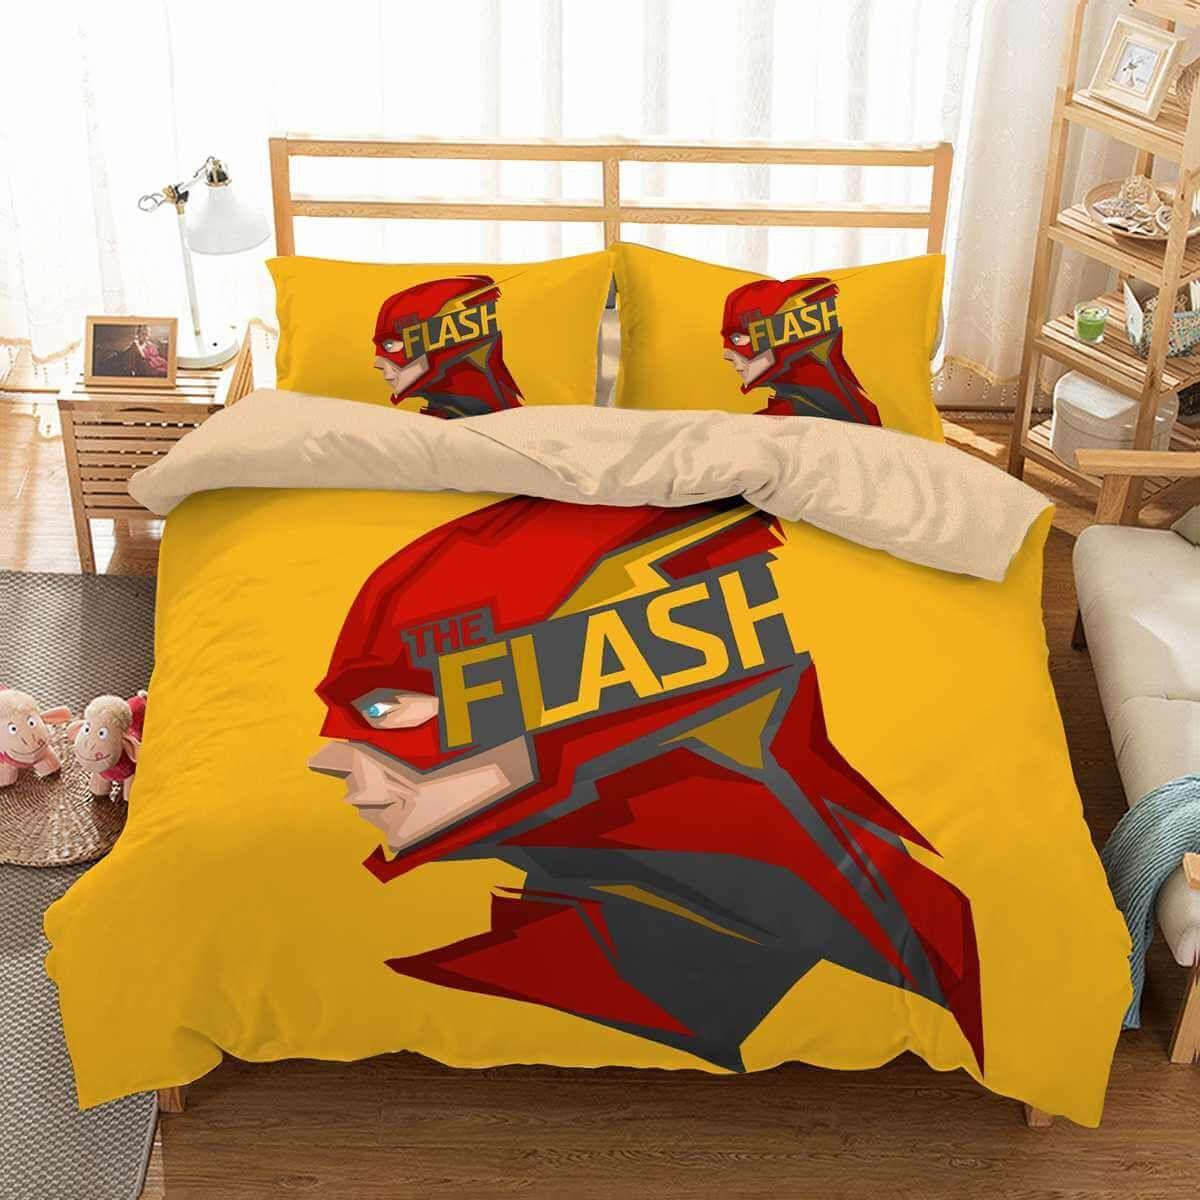 3d Customize The Flash Bedding Set Duvet Cover Set Bedroom Set Bedlinen Duvet Cover Sets Bedroom Sets Custom Bed